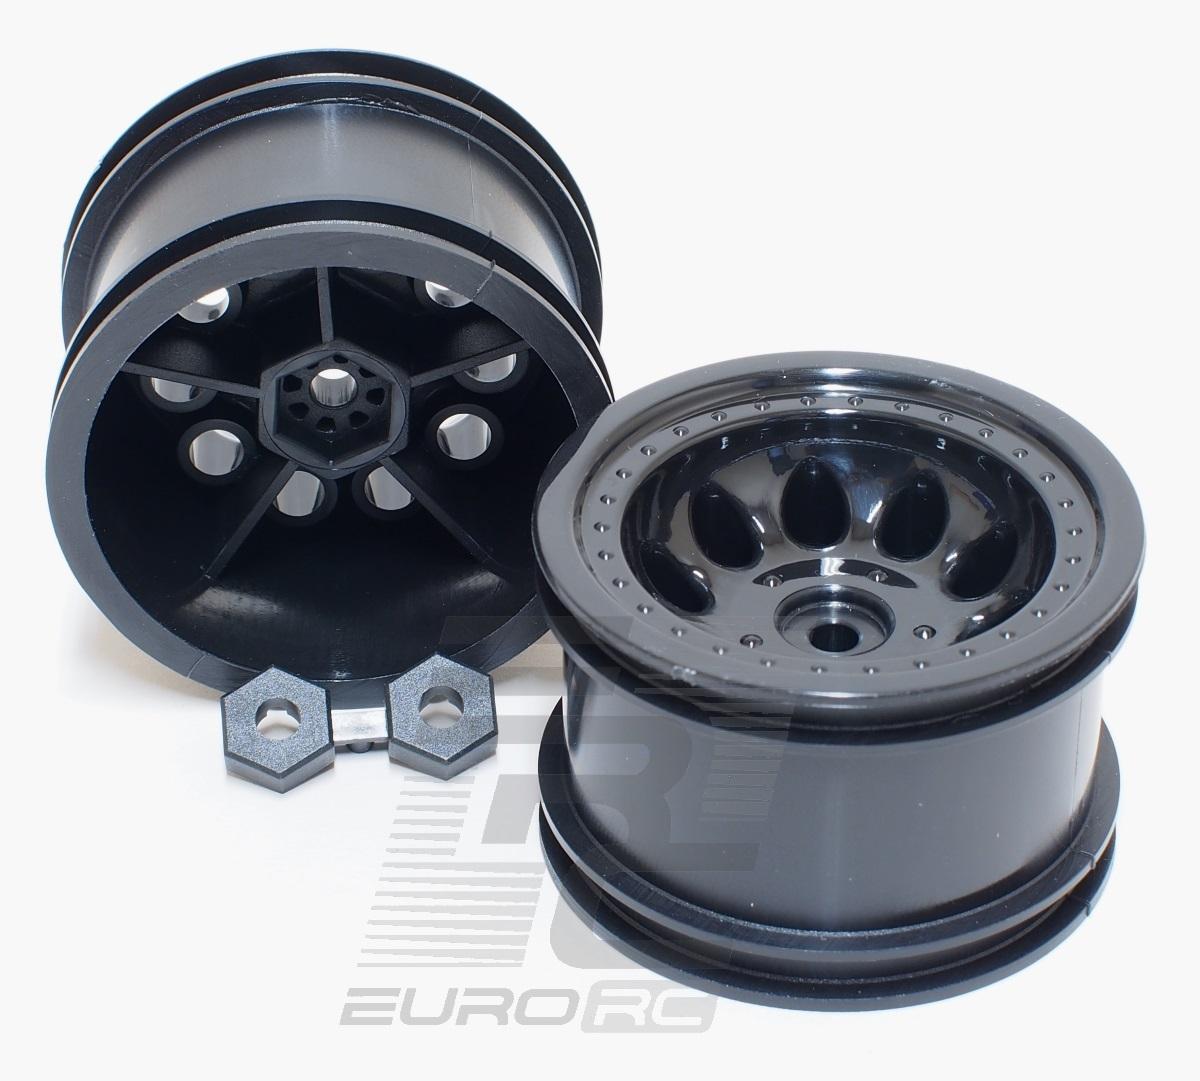 RPM Revolver 2.2 Wide Wheelbase Wheels Black Free Shipping